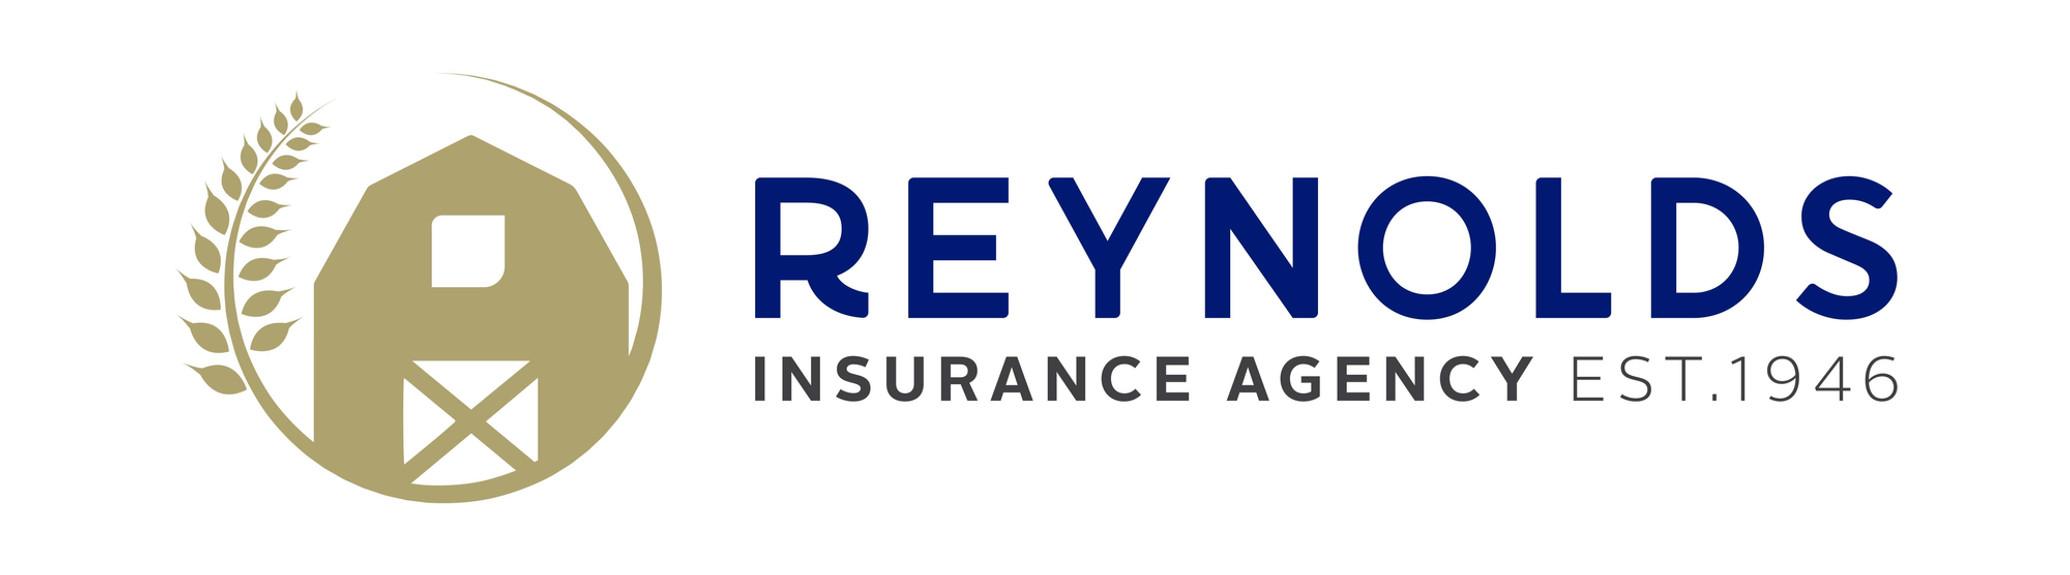 Reynolds Insurance Agency